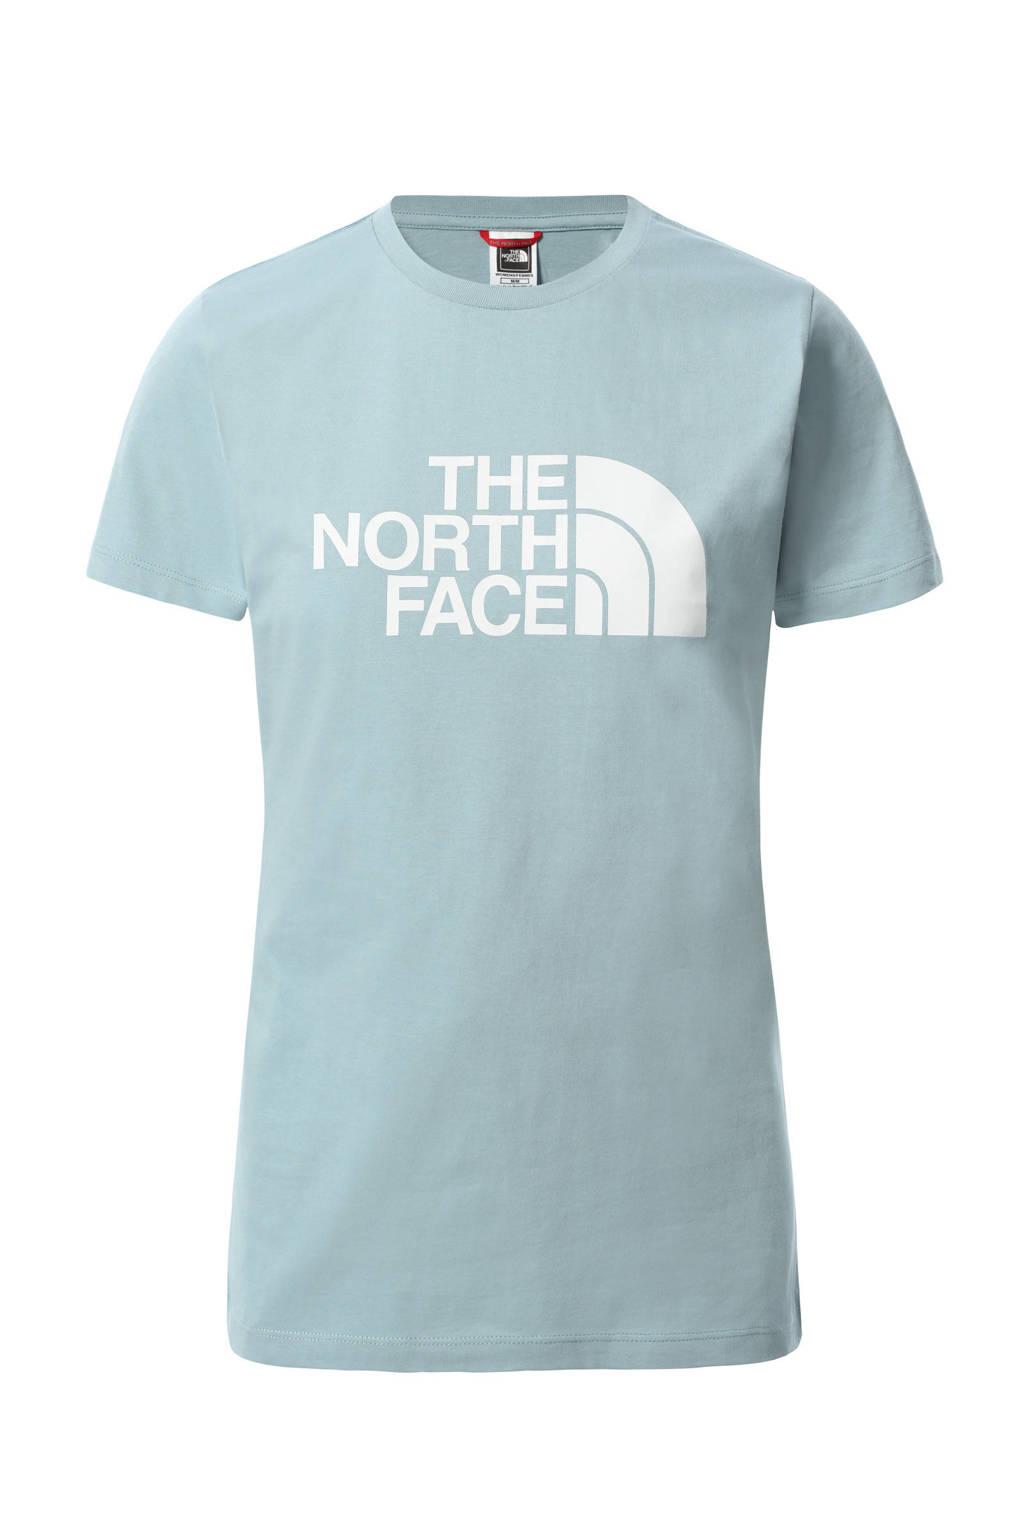 The North Face T-shirt East lichtblauw/wit, Lichtblauw/wit